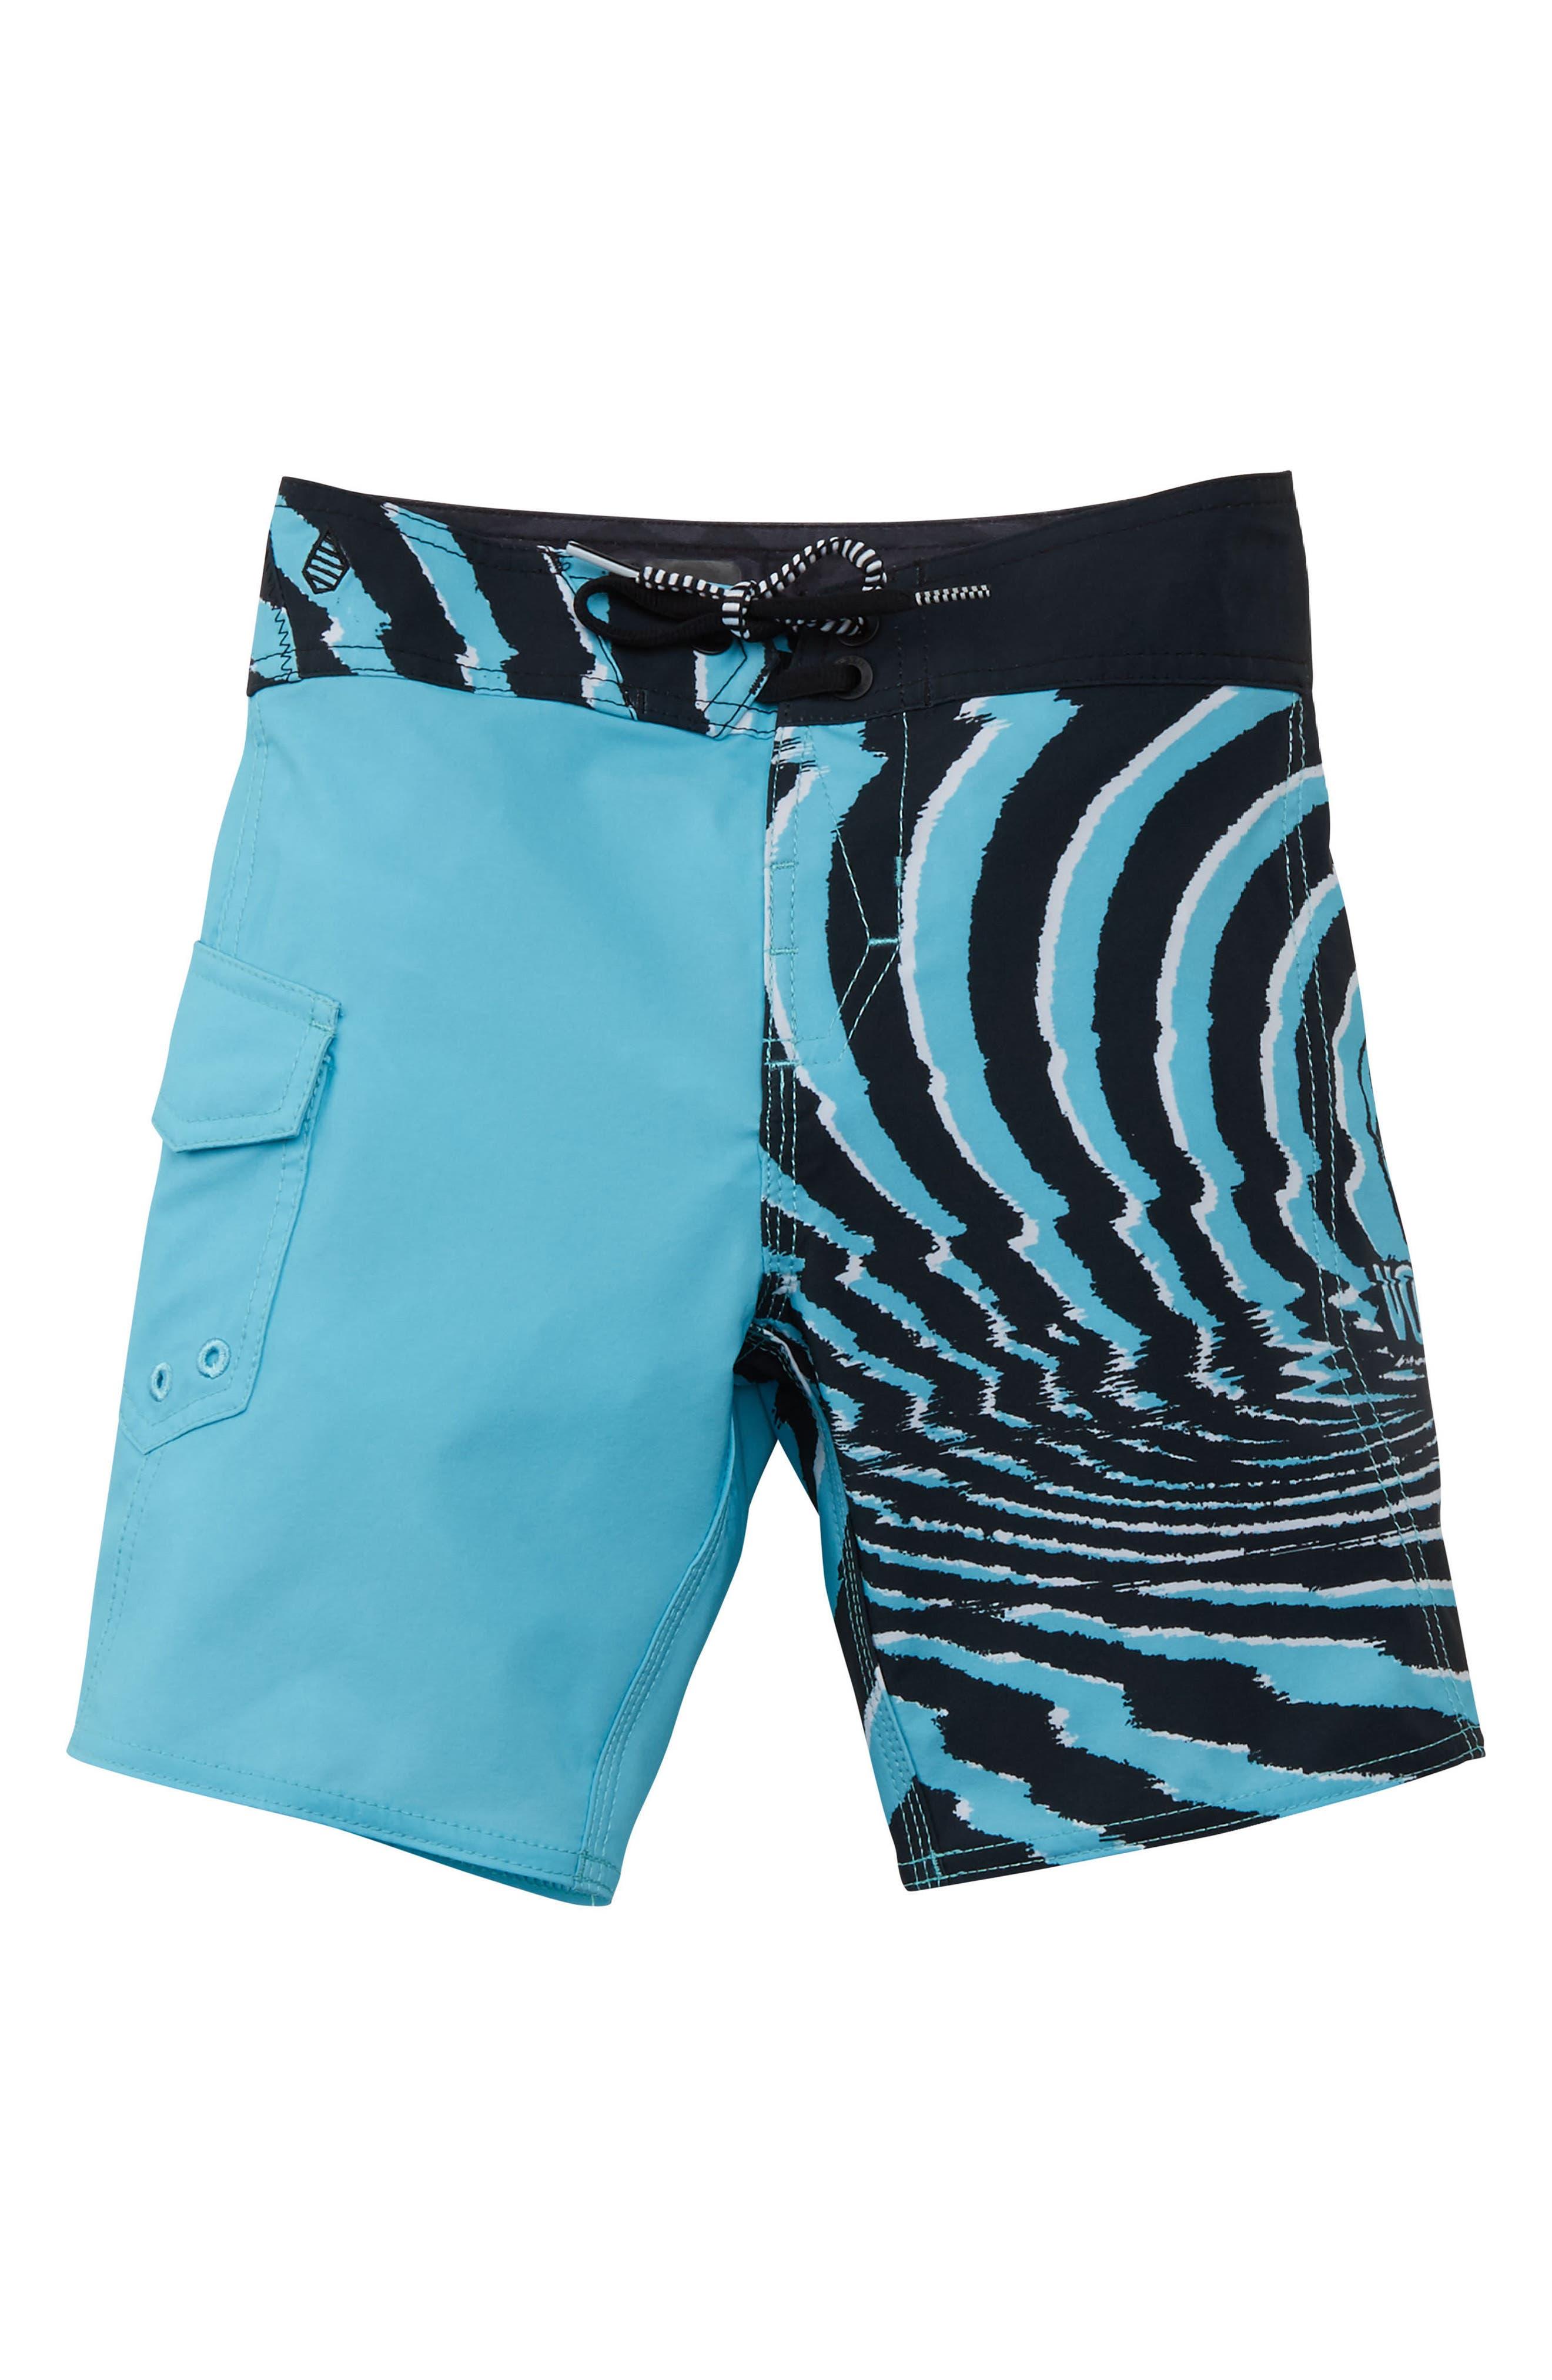 Lido Block Mod Board Shorts,                         Main,                         color, 470